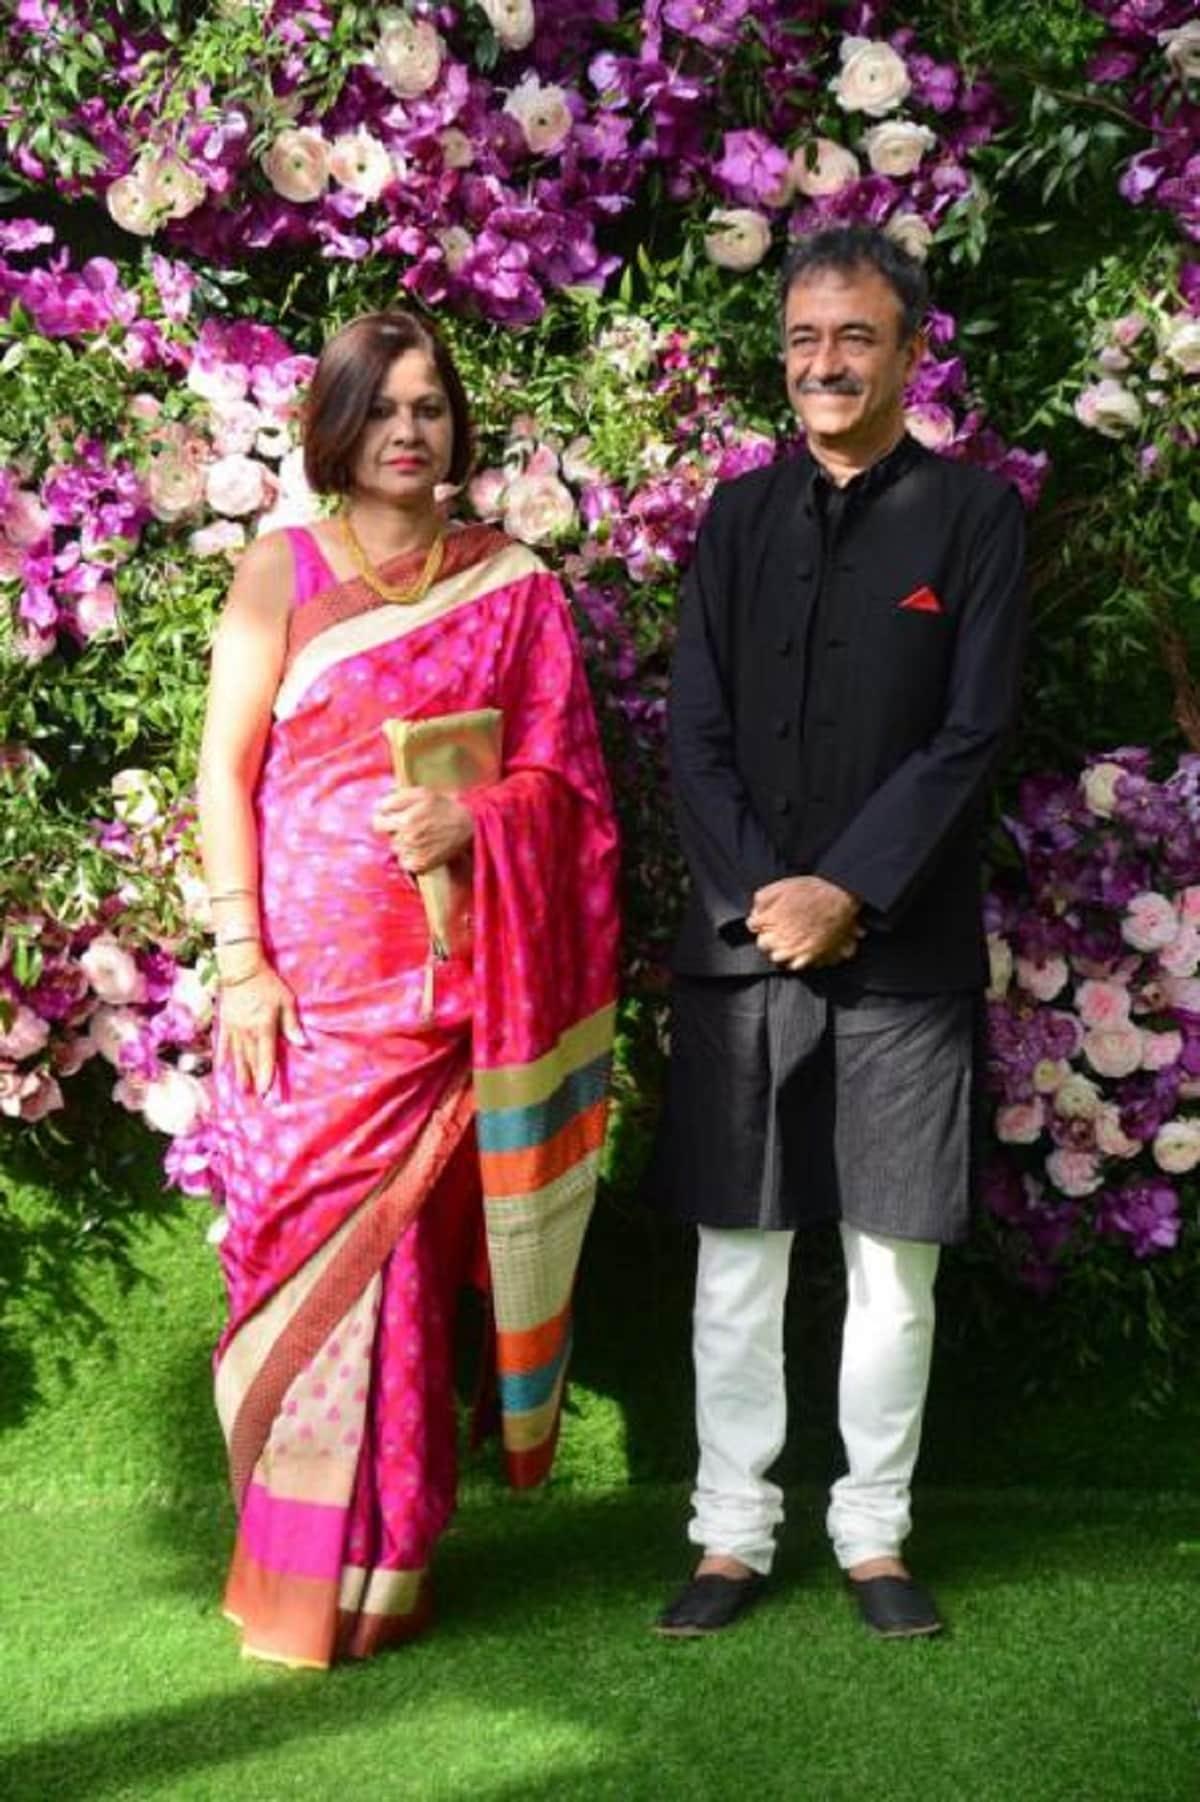 Filmmaker Raju Hirani with his wife. (Image: Viral Bhayani)